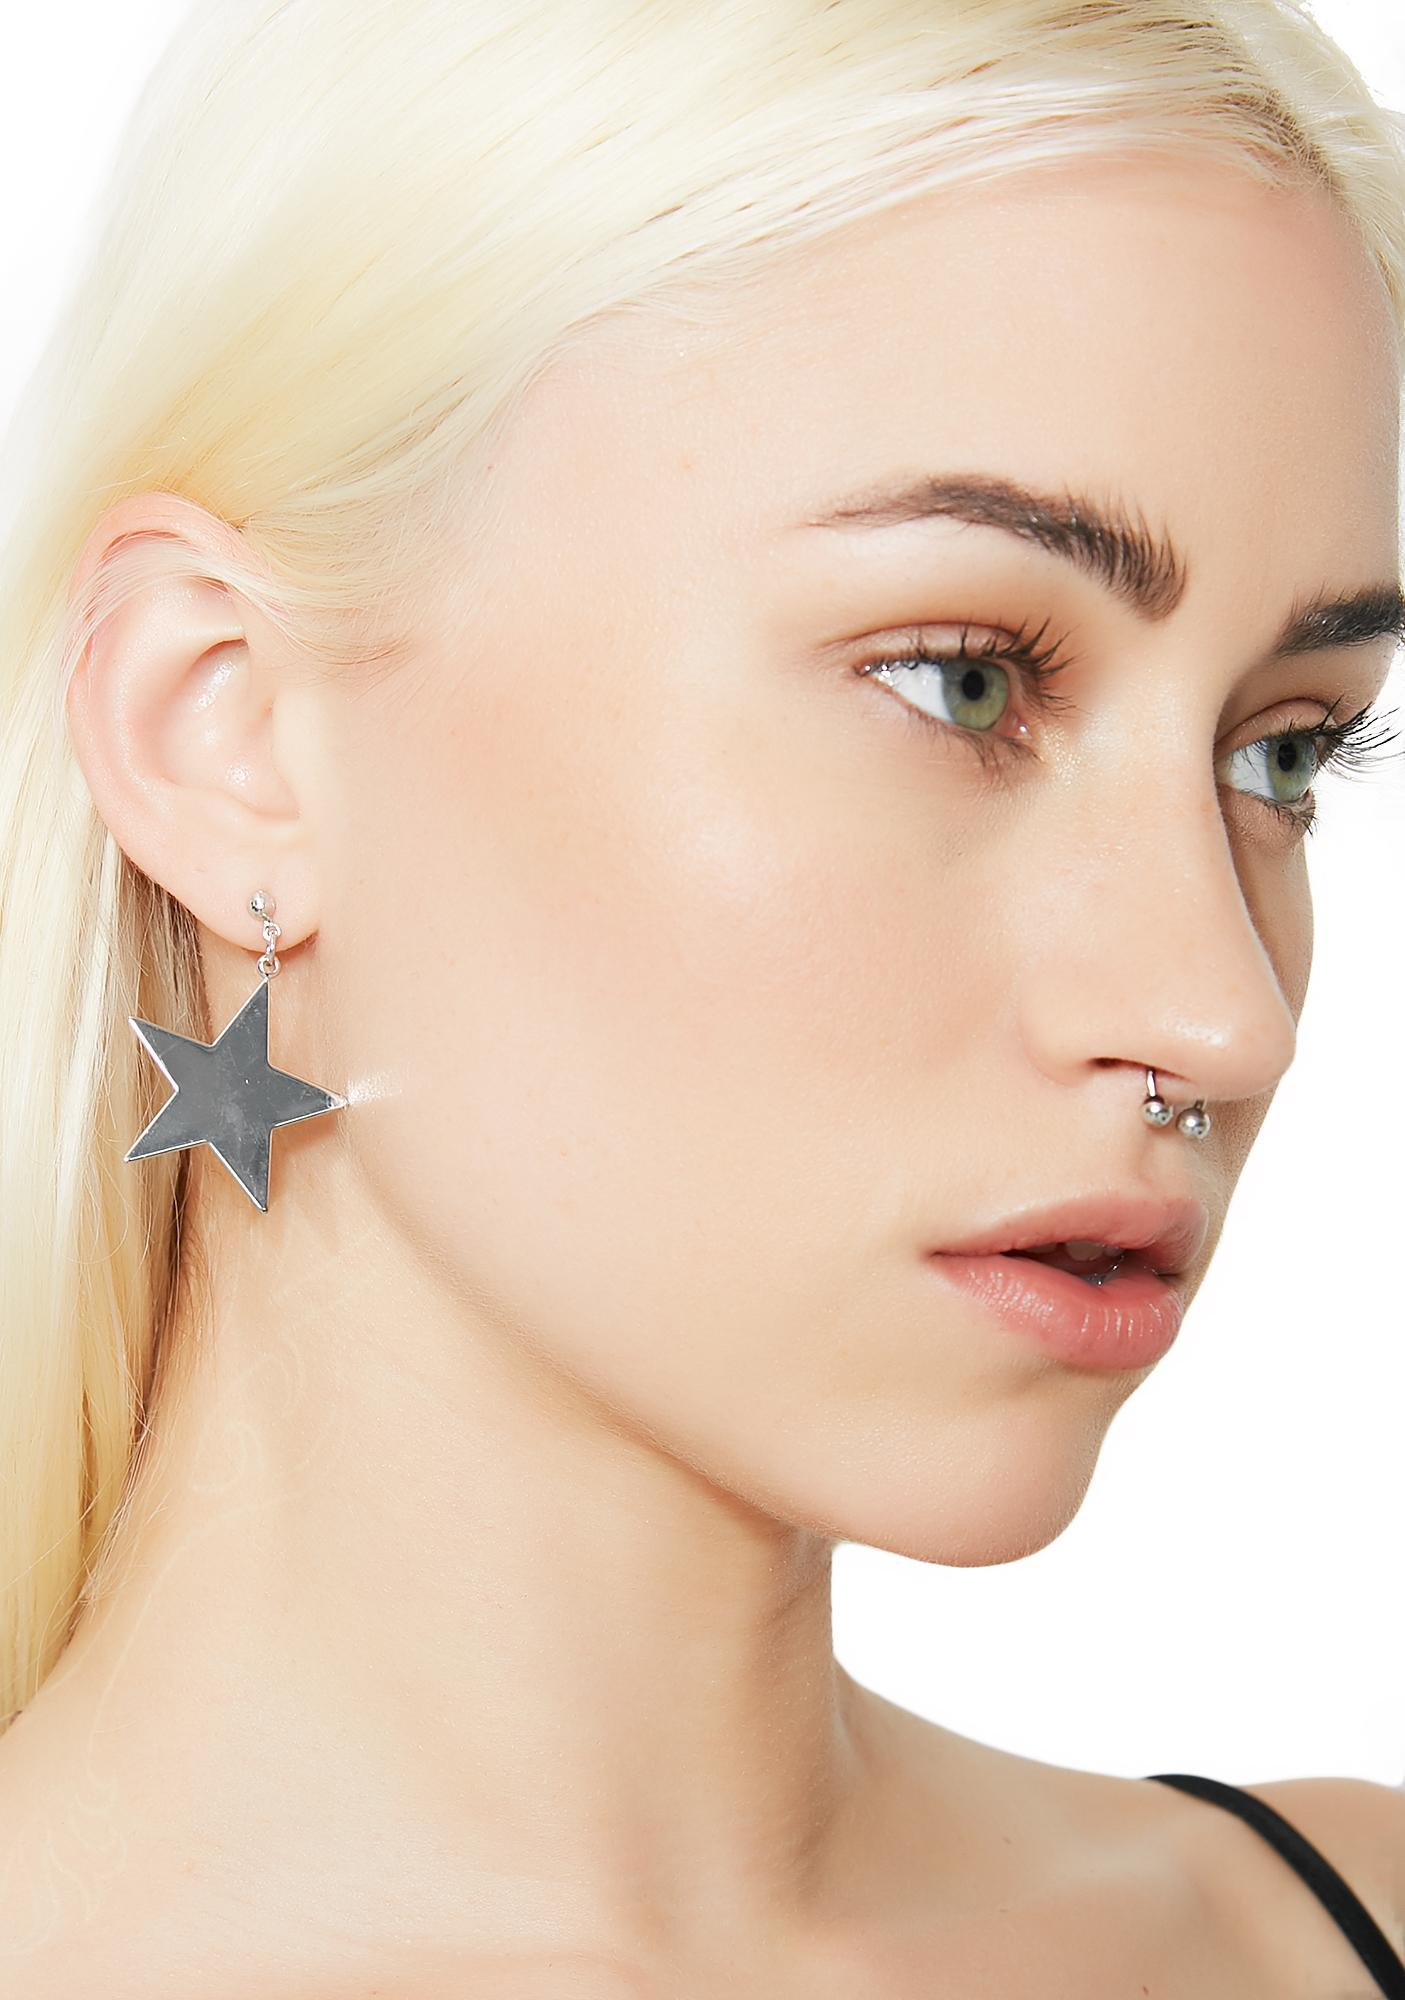 Big Bang Mismatch Earrings